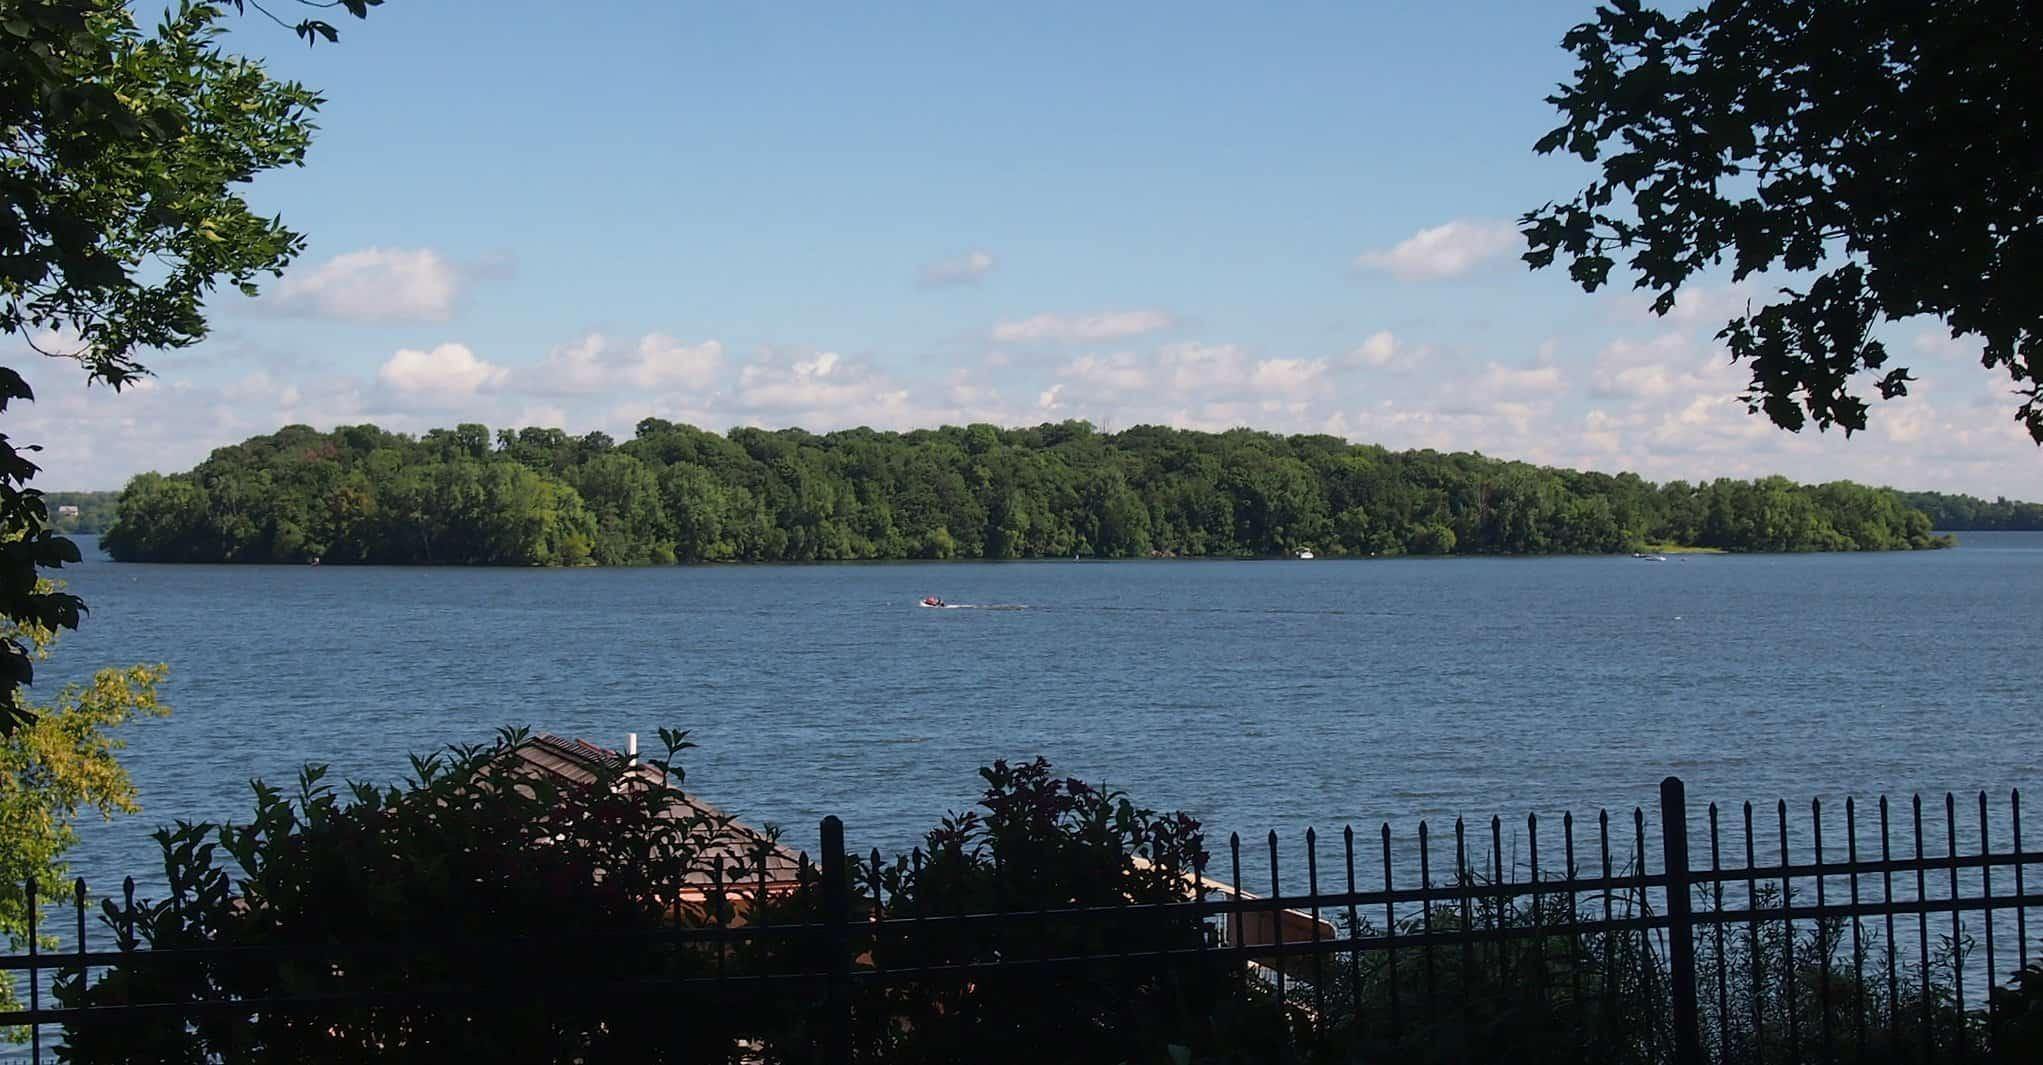 Lake Waconia, Waconia, Minnesota